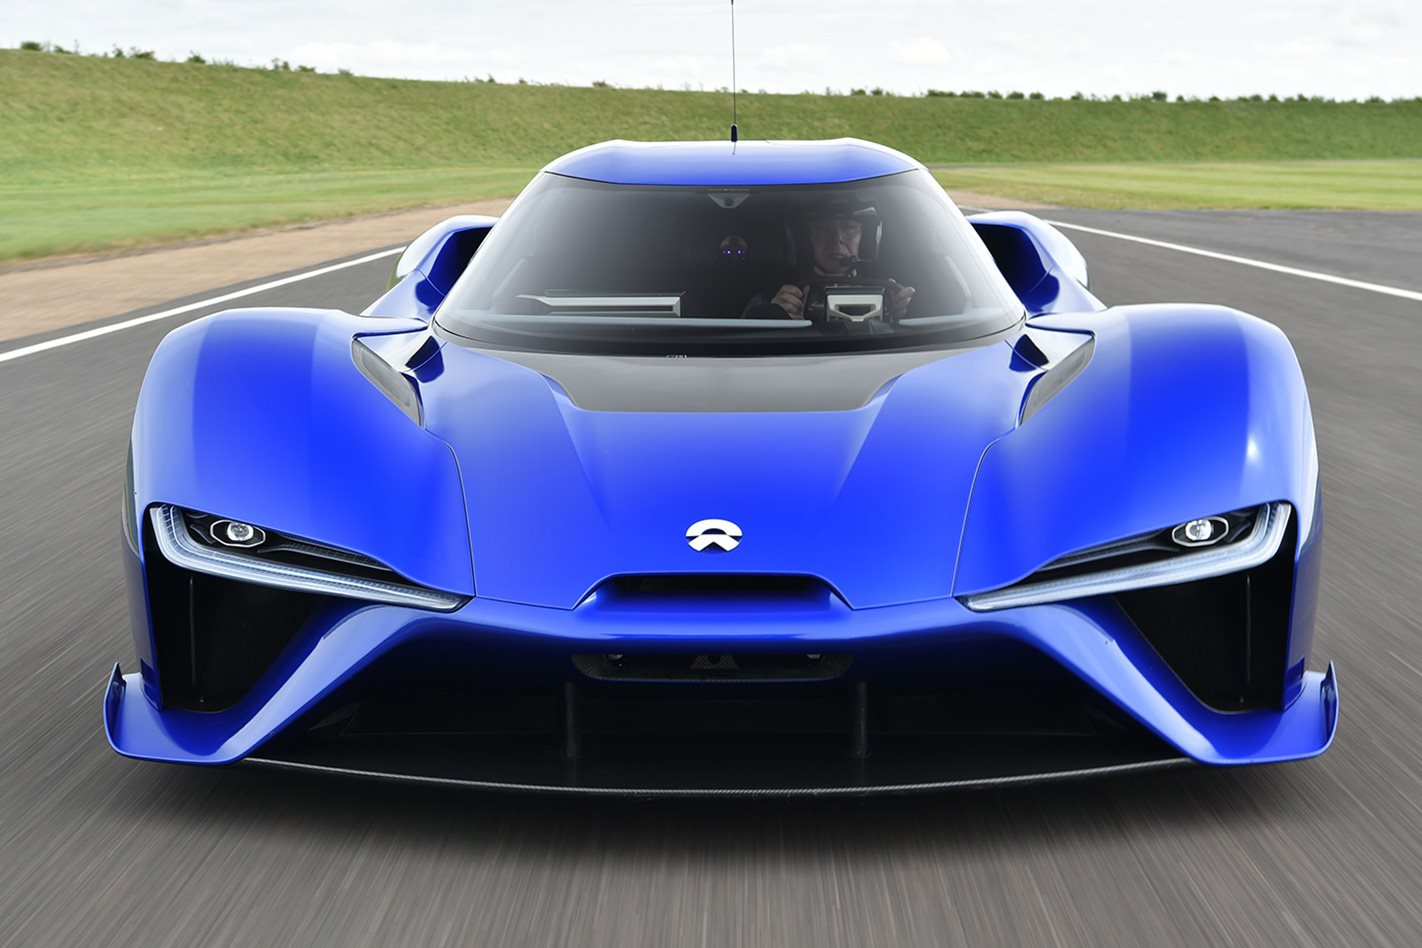 2018-NIO-EP9-electric-supercar-headlights.jpg